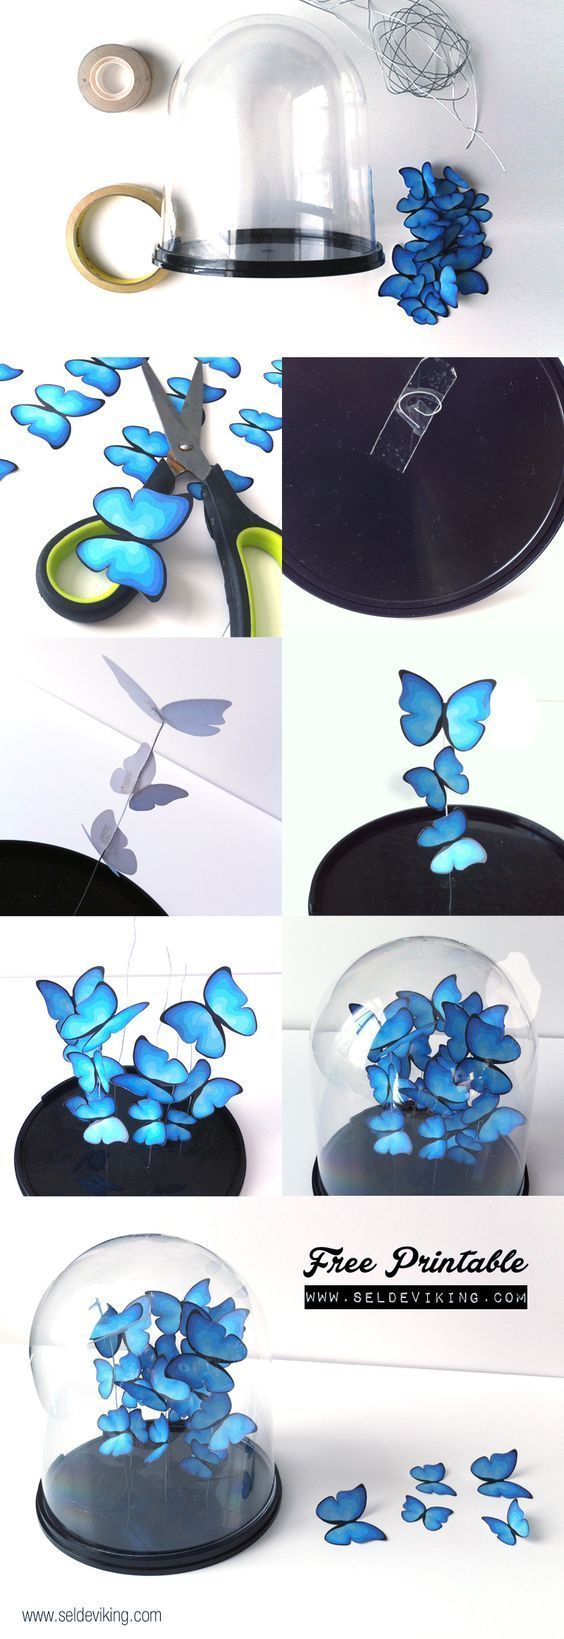 21 Brilliant Turquoise DIY Room Decor Ideas | Pinterest | Bathroom ...